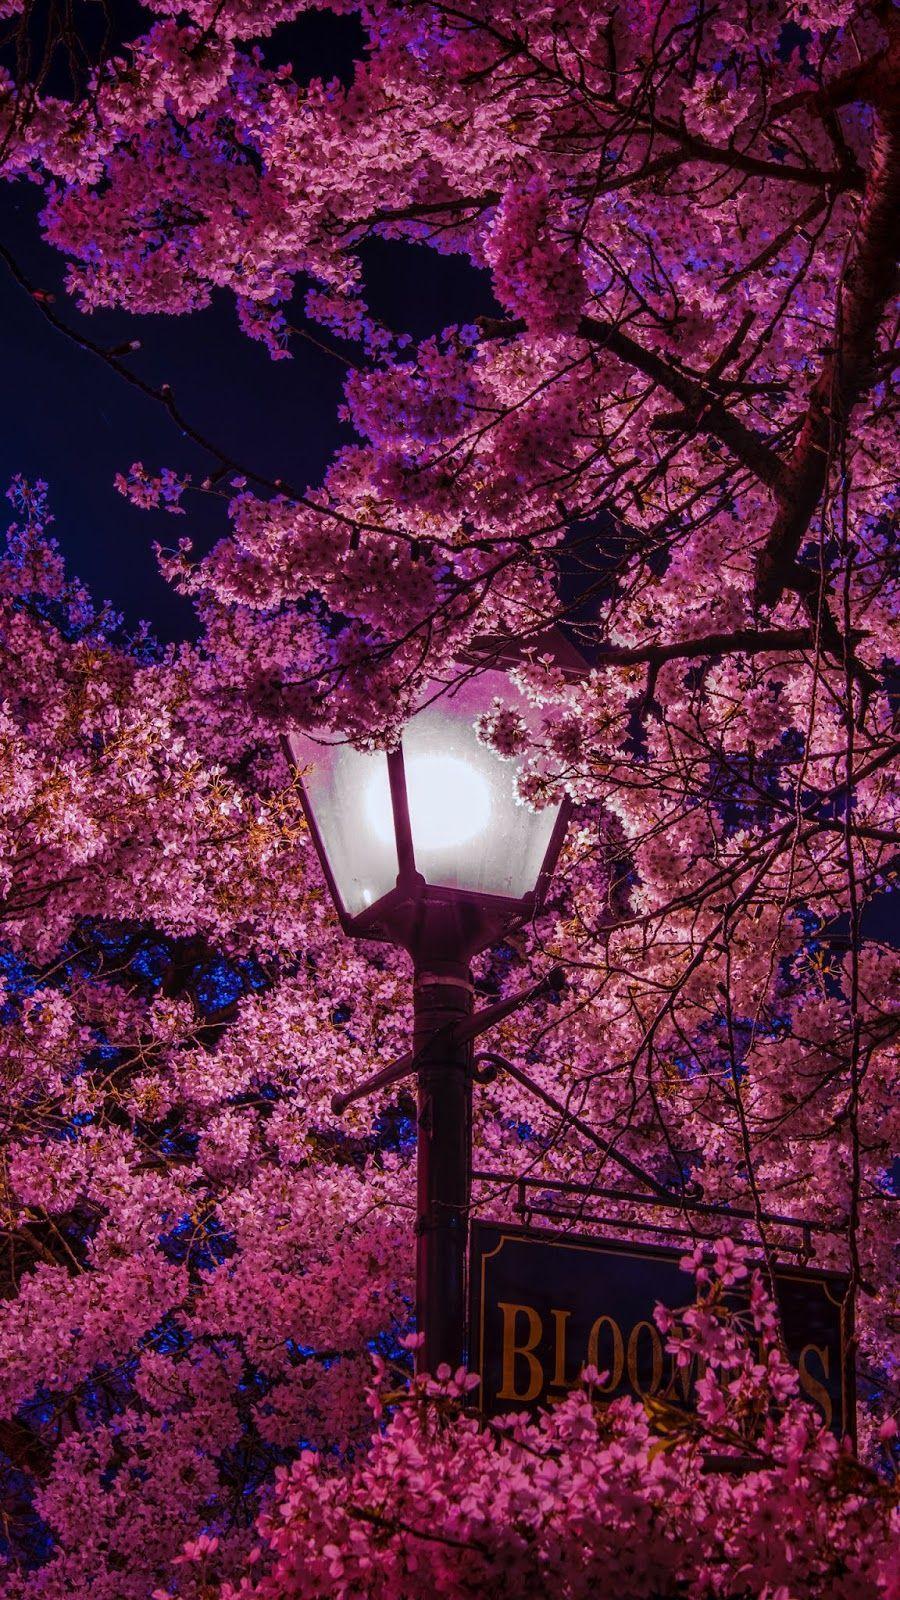 Sakura Night Wallpaper Iphone Android Background Followme Spring Wallpaper Flower Phone Wallpaper Pretty Wallpaper Iphone